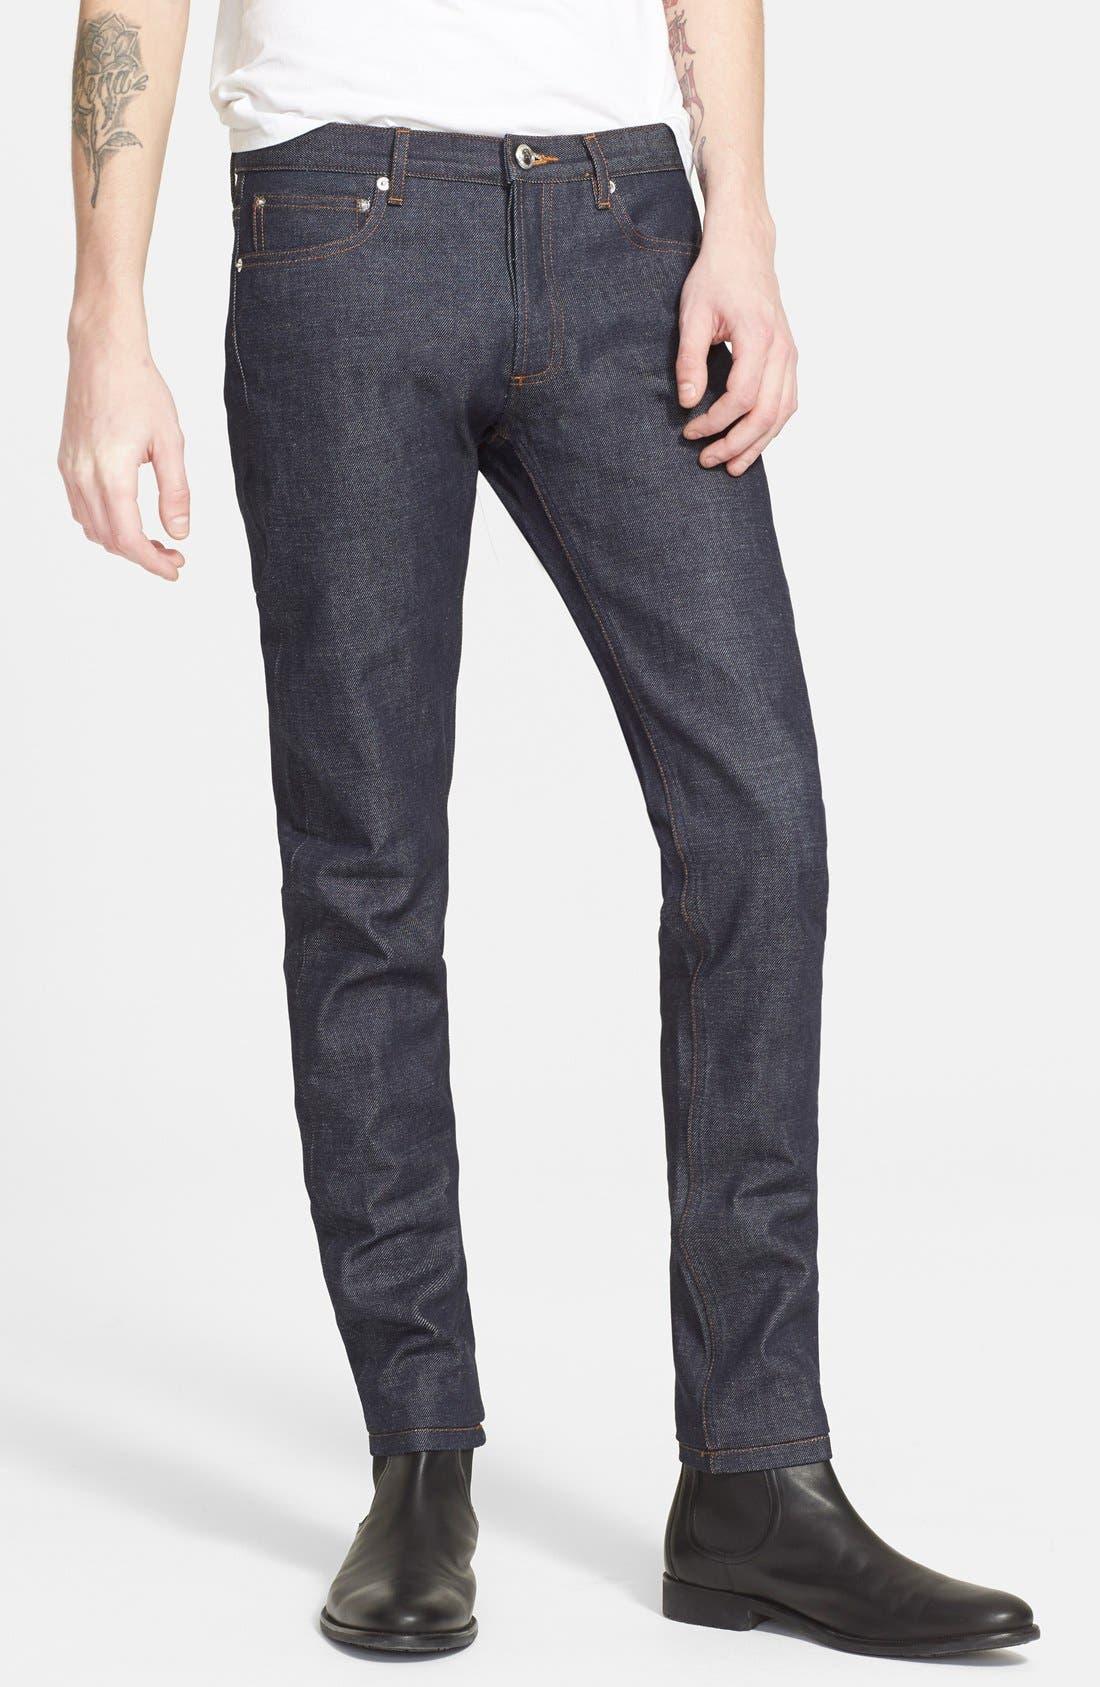 A.P.C. Petit Standard Slim Fit Selvedge Jeans (Indigo)